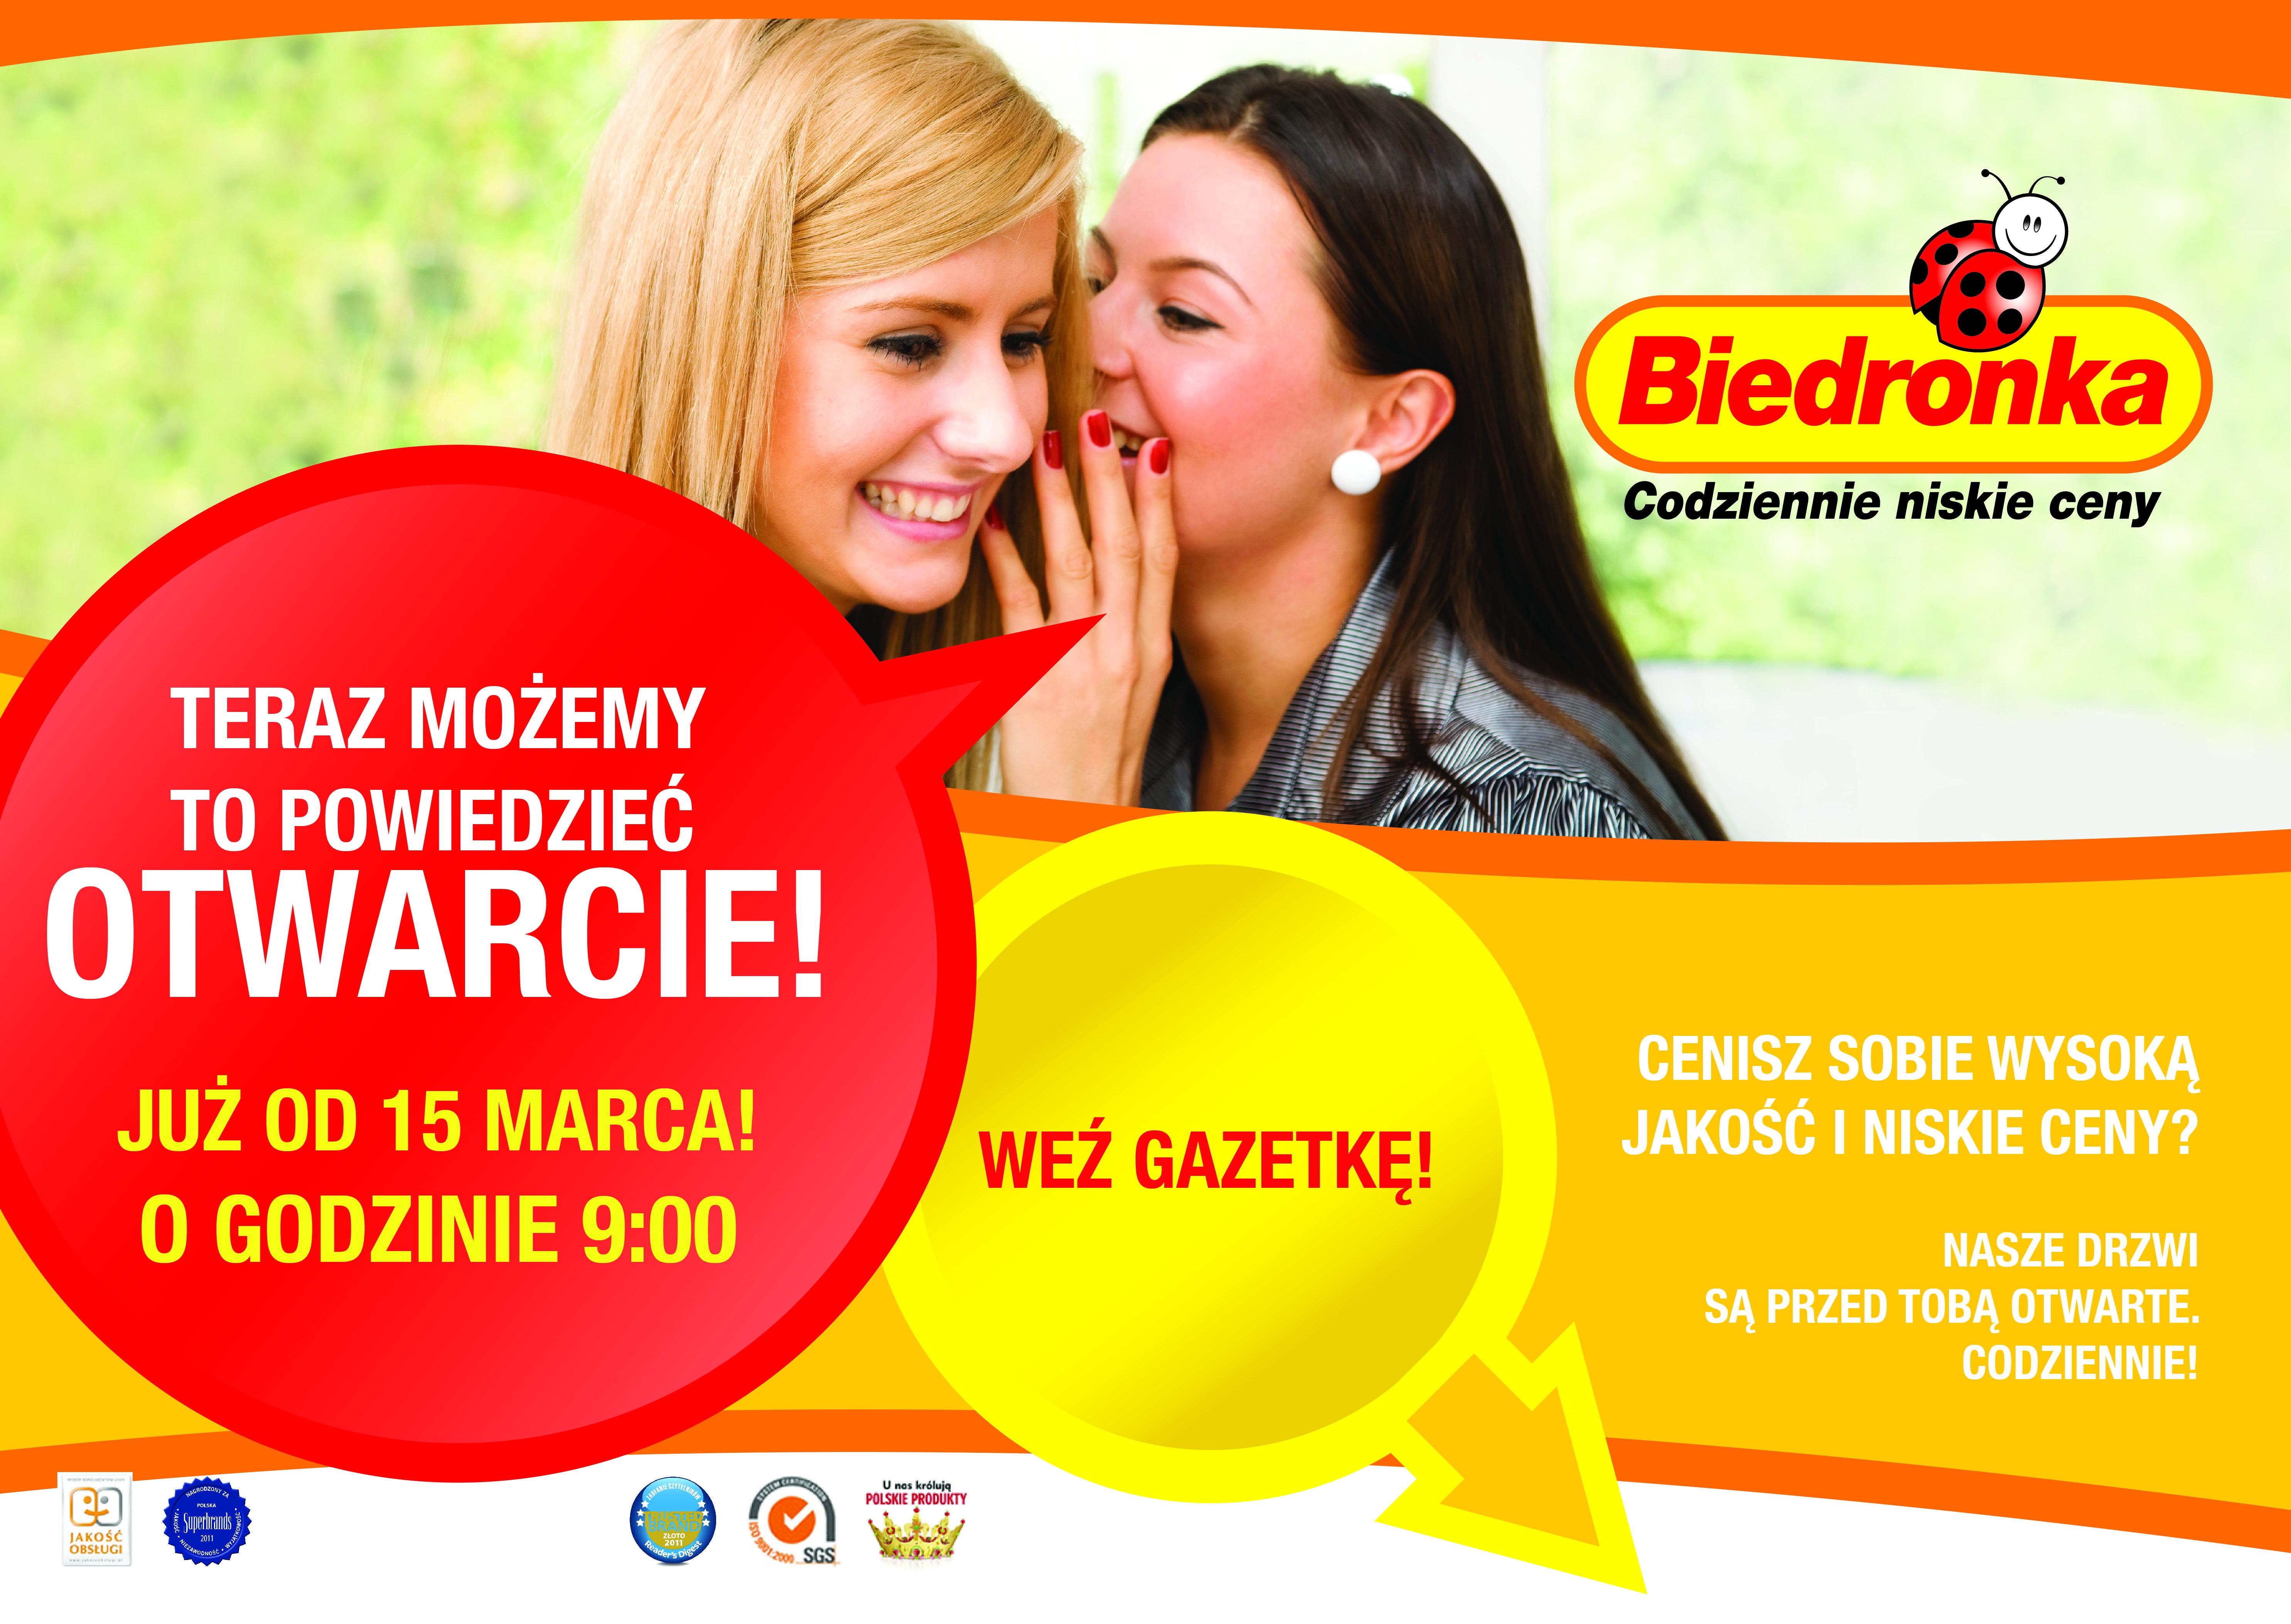 b1_biedronka-01